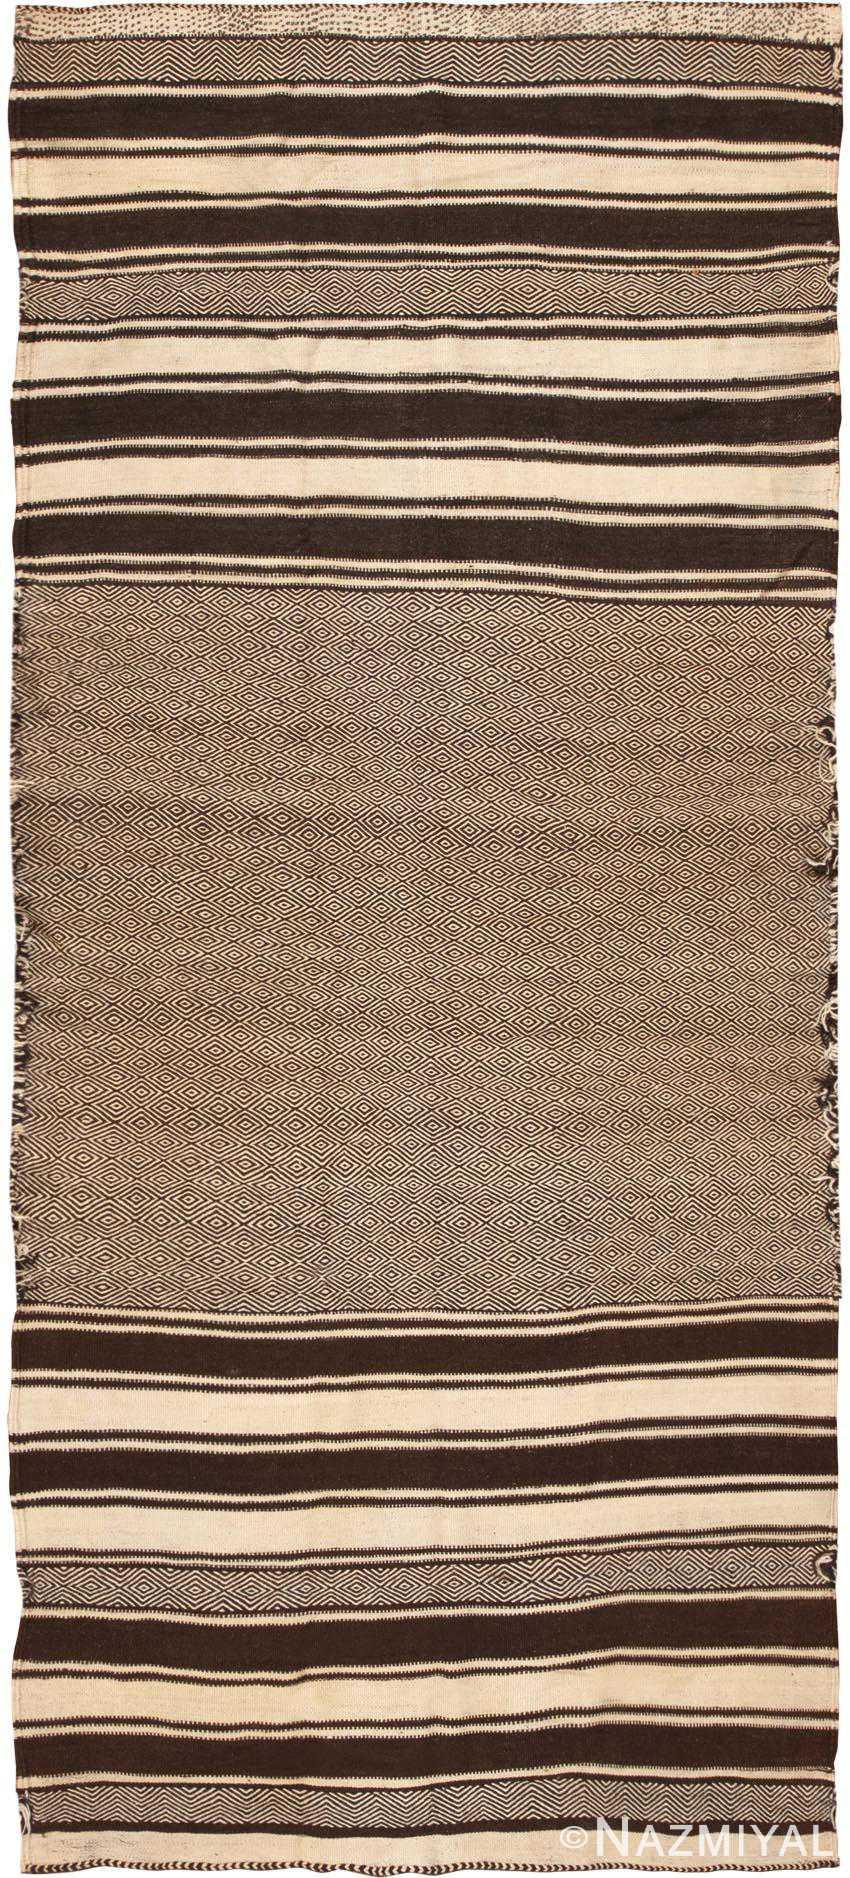 Vintage Moroccan Rug 46468 Detail/Large View